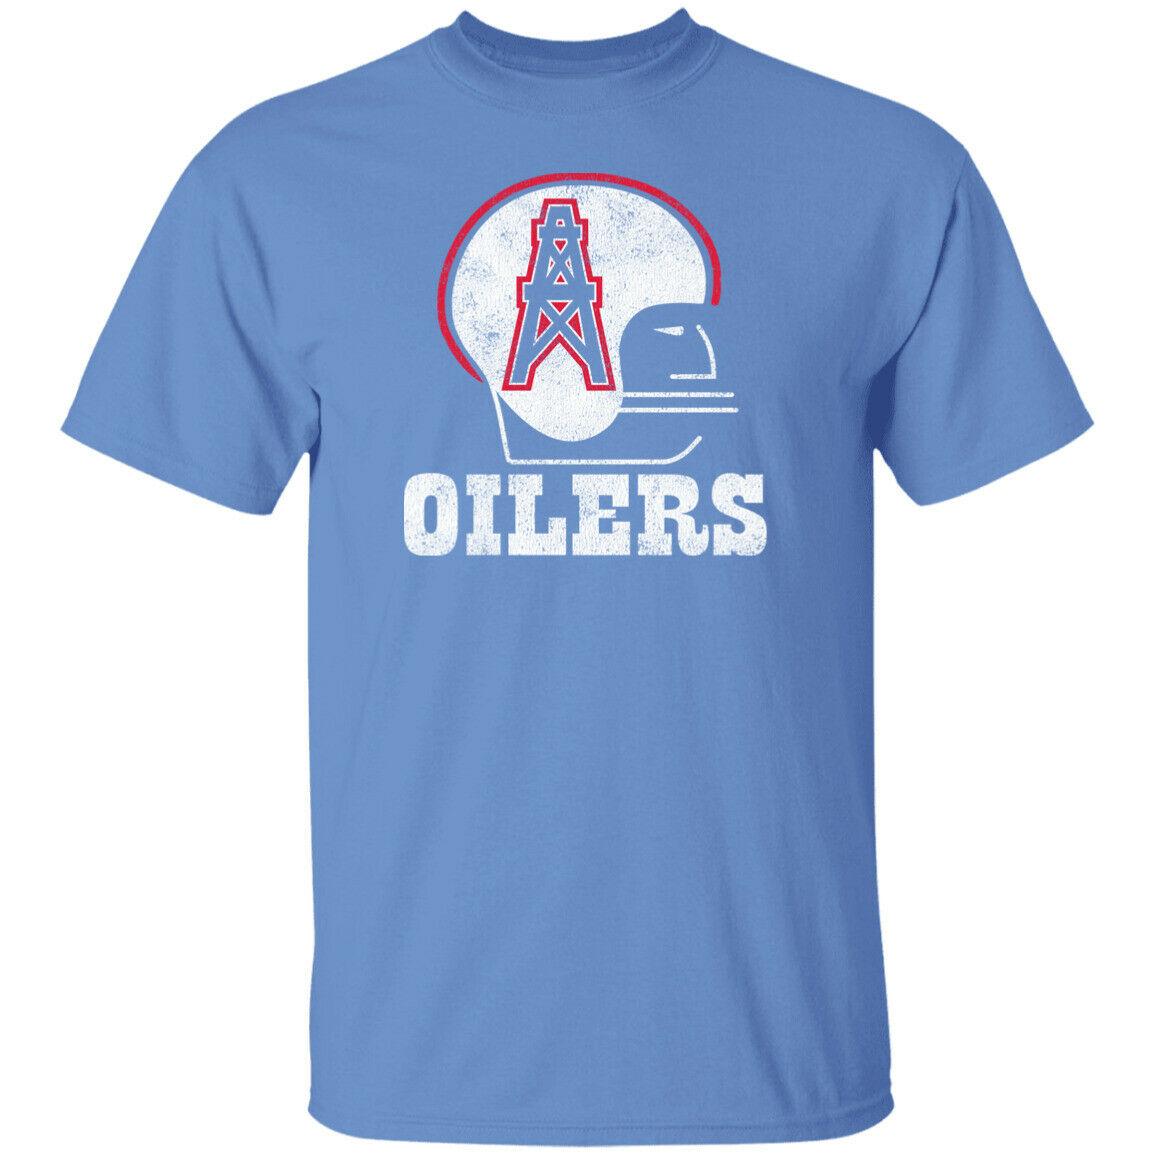 Camiseta divertida Retro con texto desgastado Oilers de Houston, Texas